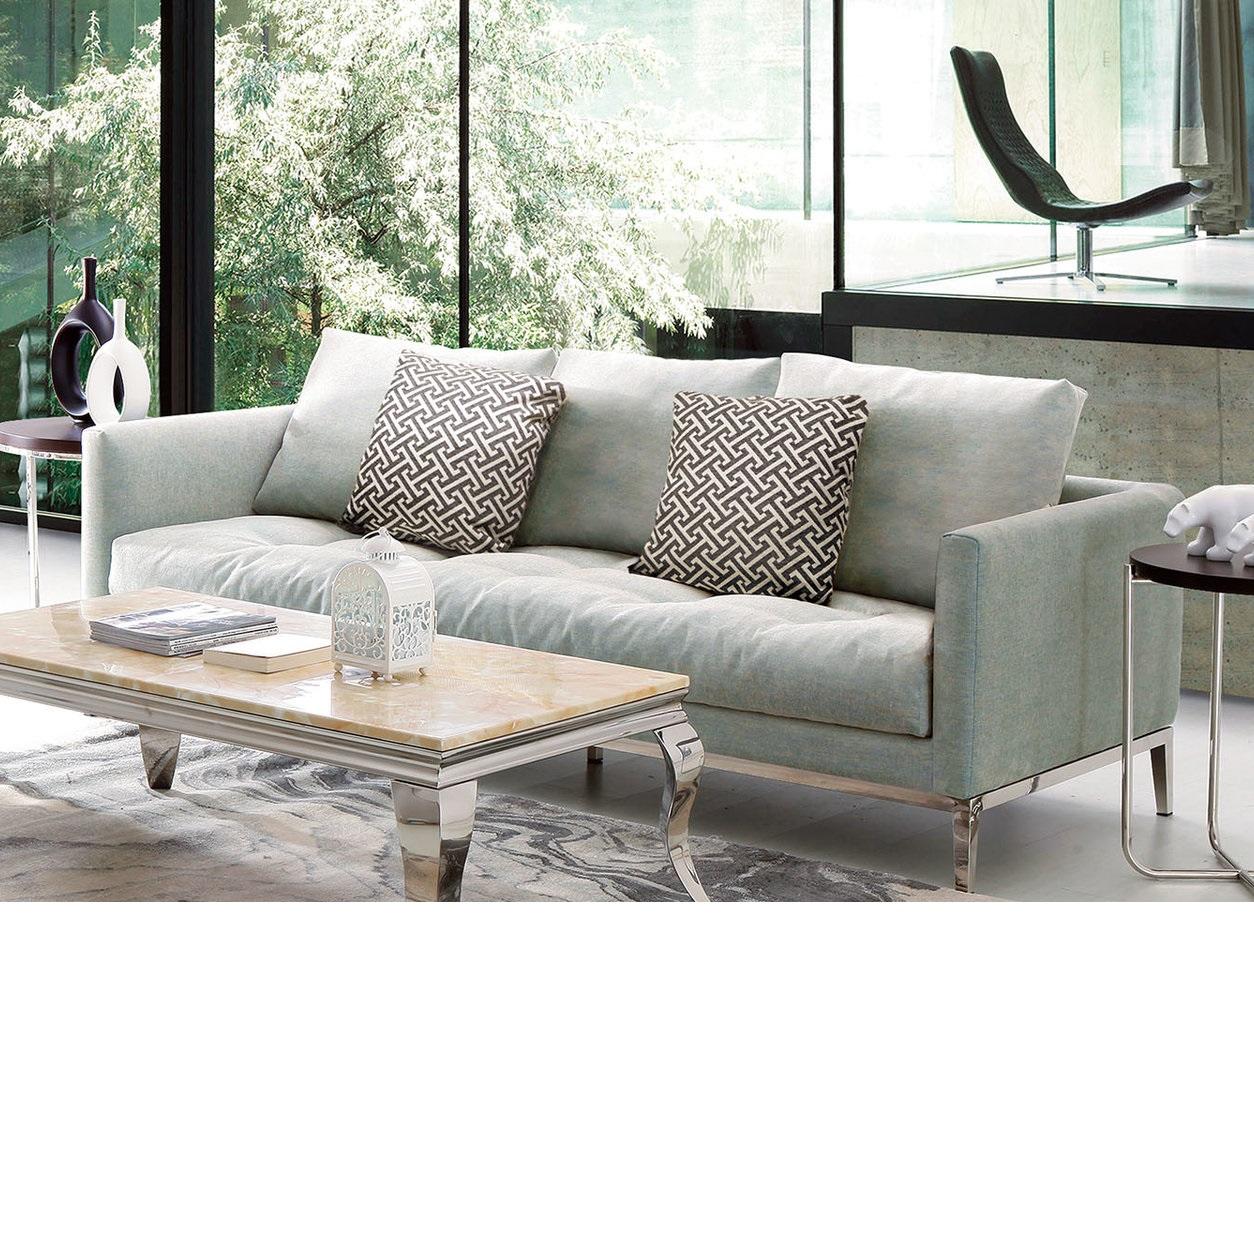 Modern Living Room Furniture | Modern Sectional Sofa | Loveseat